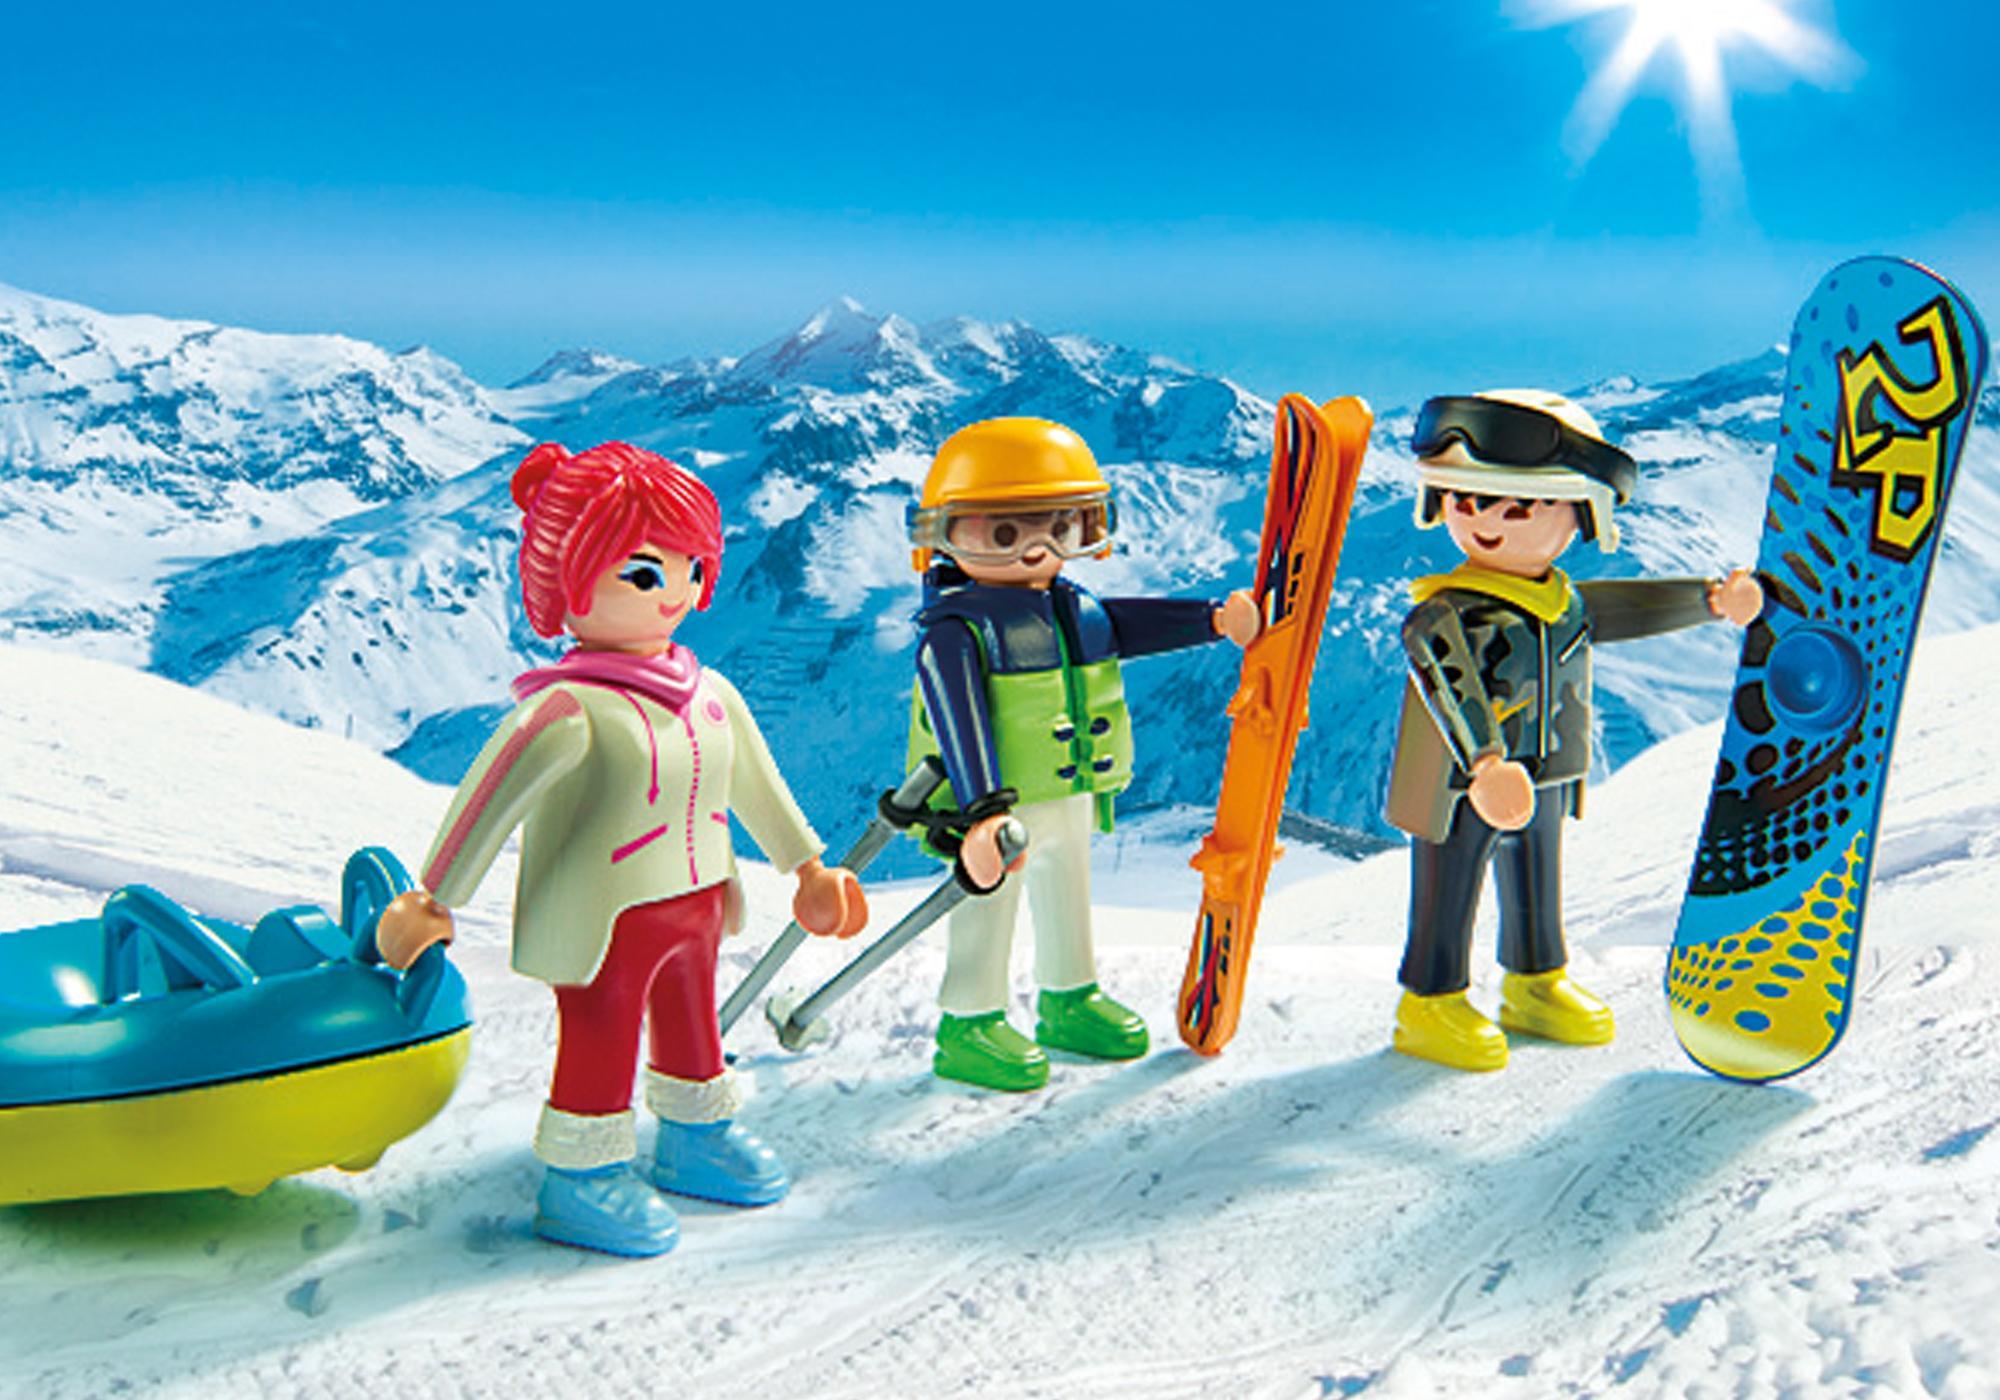 http://media.playmobil.com/i/playmobil/9286_product_extra1/Freizeit-Wintersportler